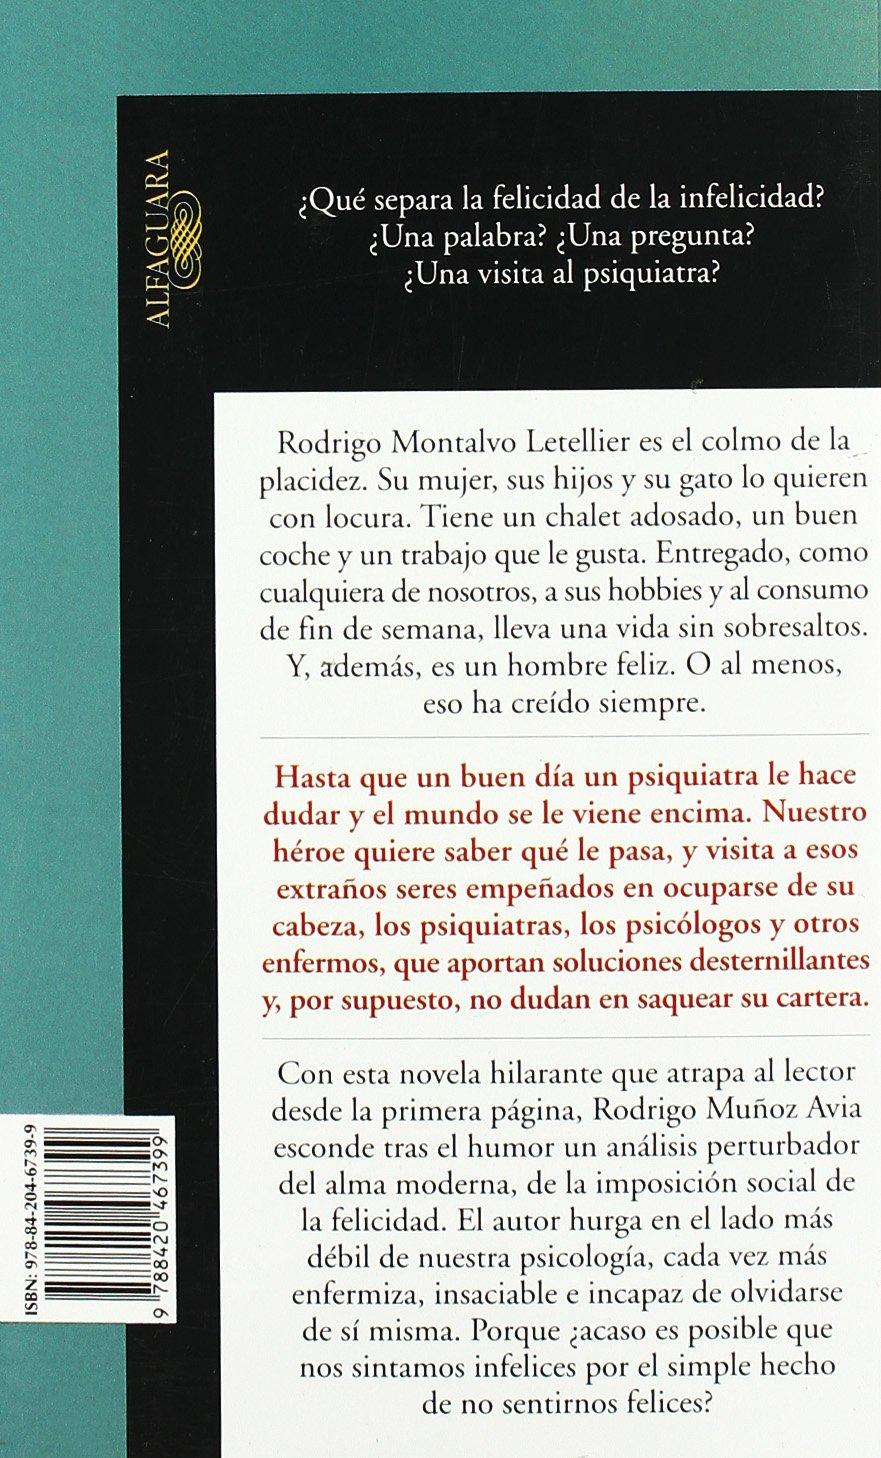 Psiquiatras, Psicologos y Otros Enfermos (Spanish Edition): Rodrigo Muñoz Avia: 9788420467399: Amazon.com: Books